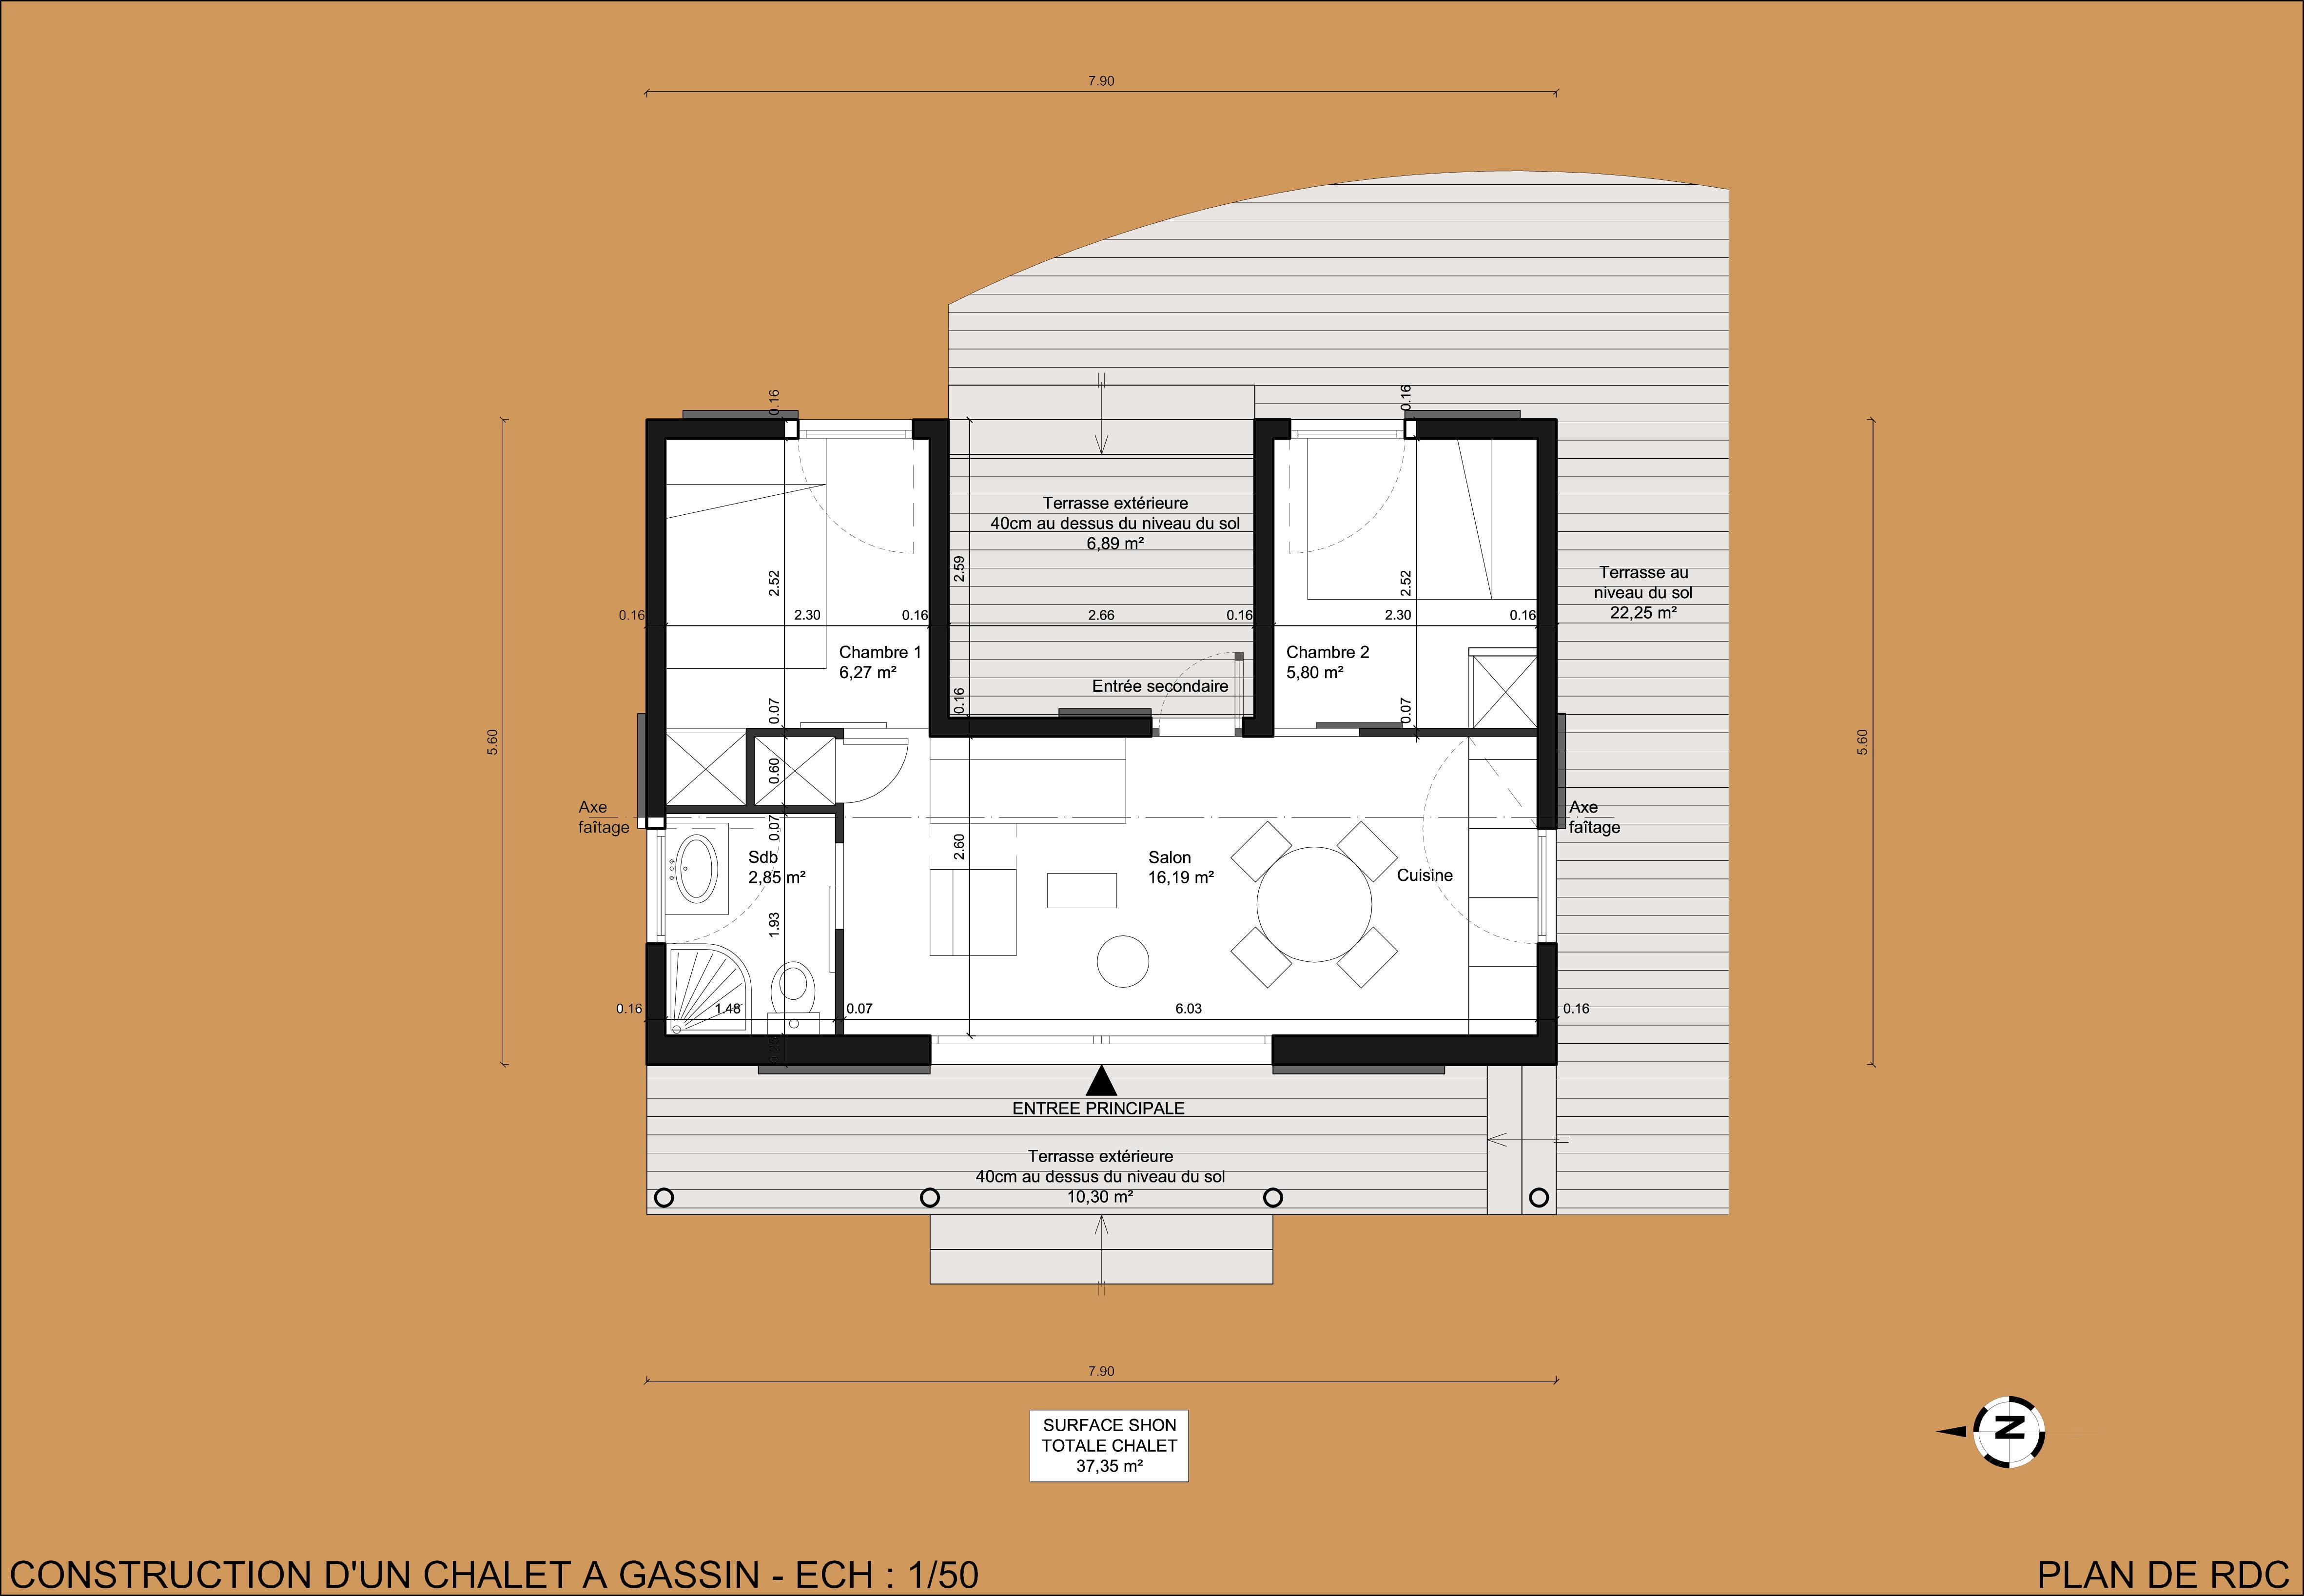 plans-Rdc-2.jpg